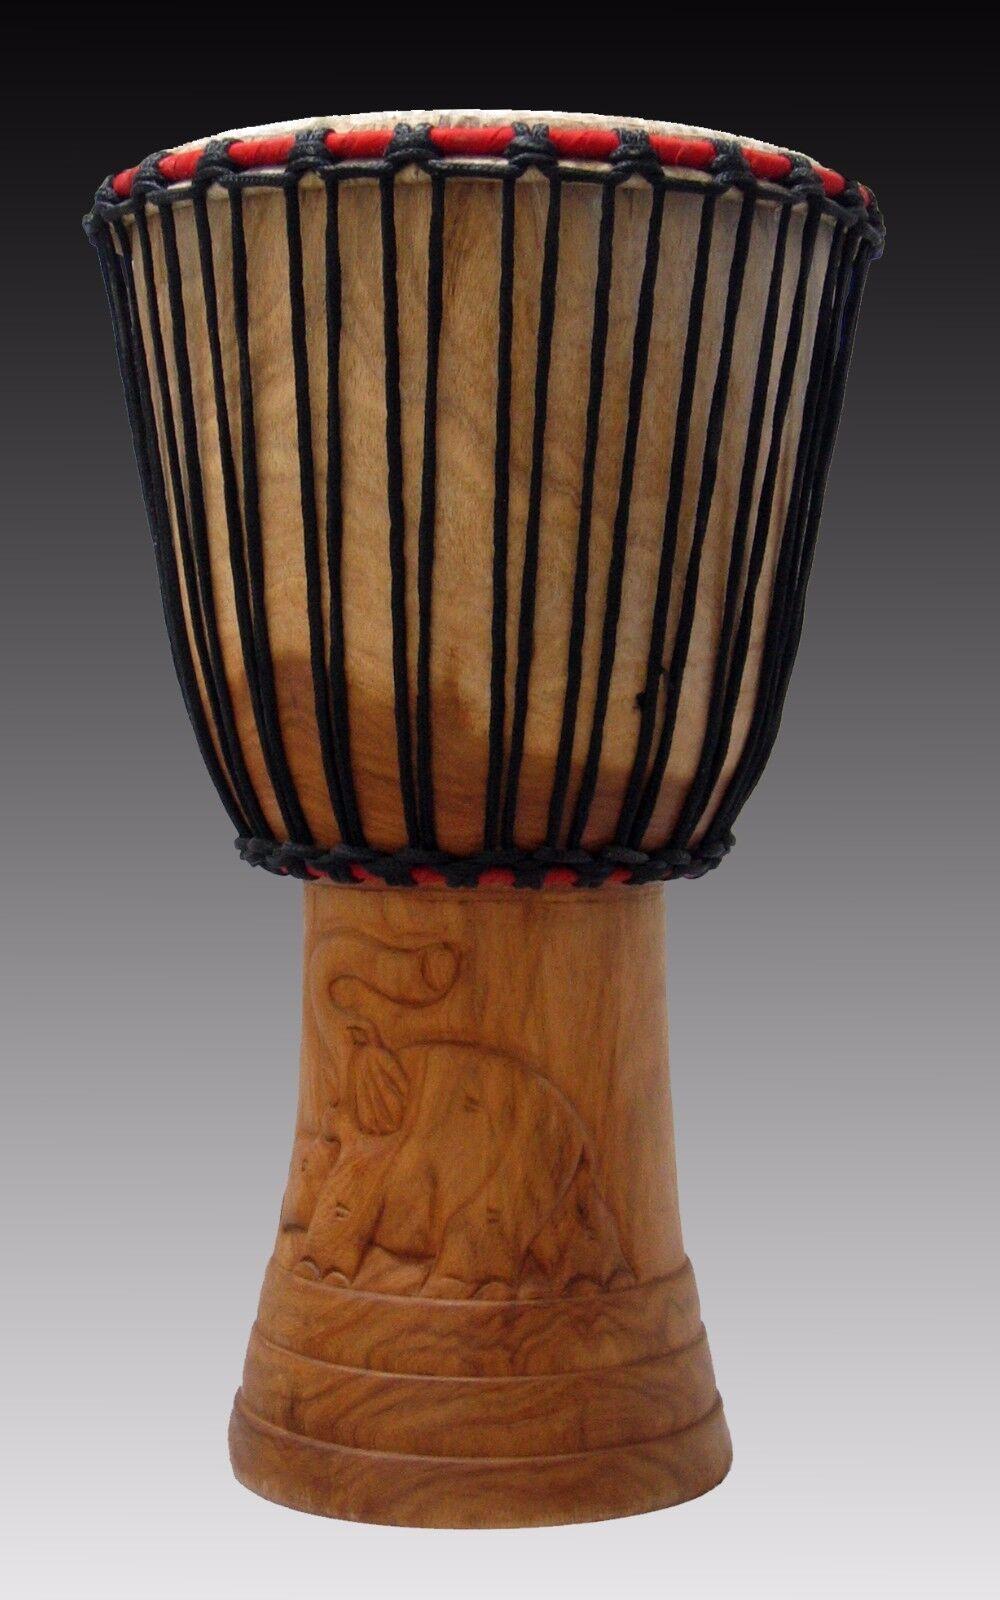 14  Djembe - Ozi Ozaa Pro Series Djembe Hand Crafted in Ghana